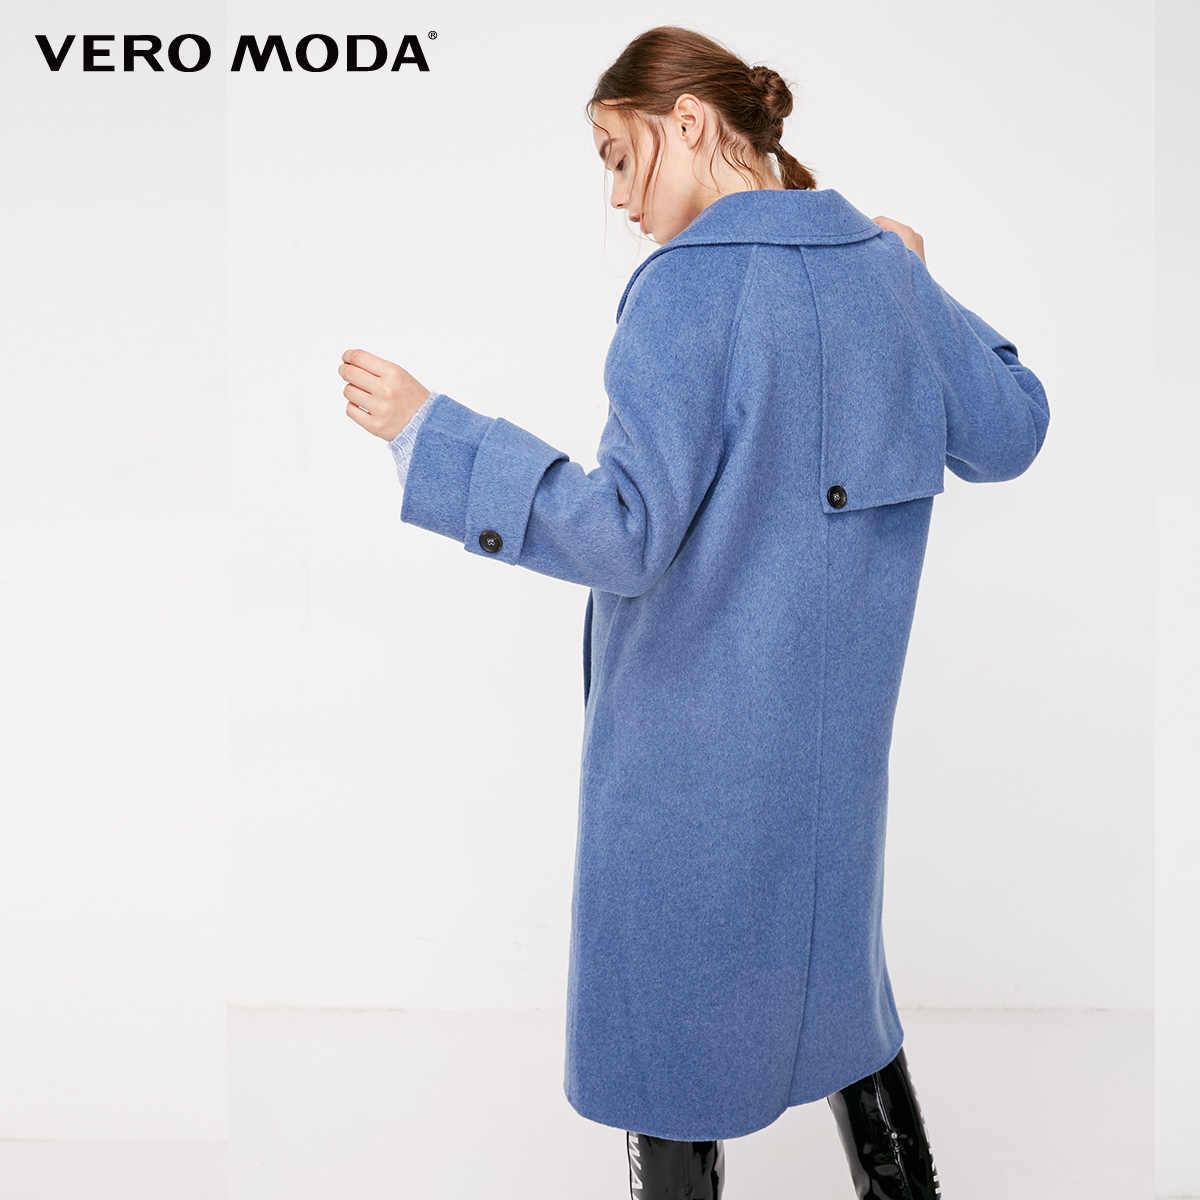 Vero Moda Women's Lapel Pure Long Woolen Coat | 318327566